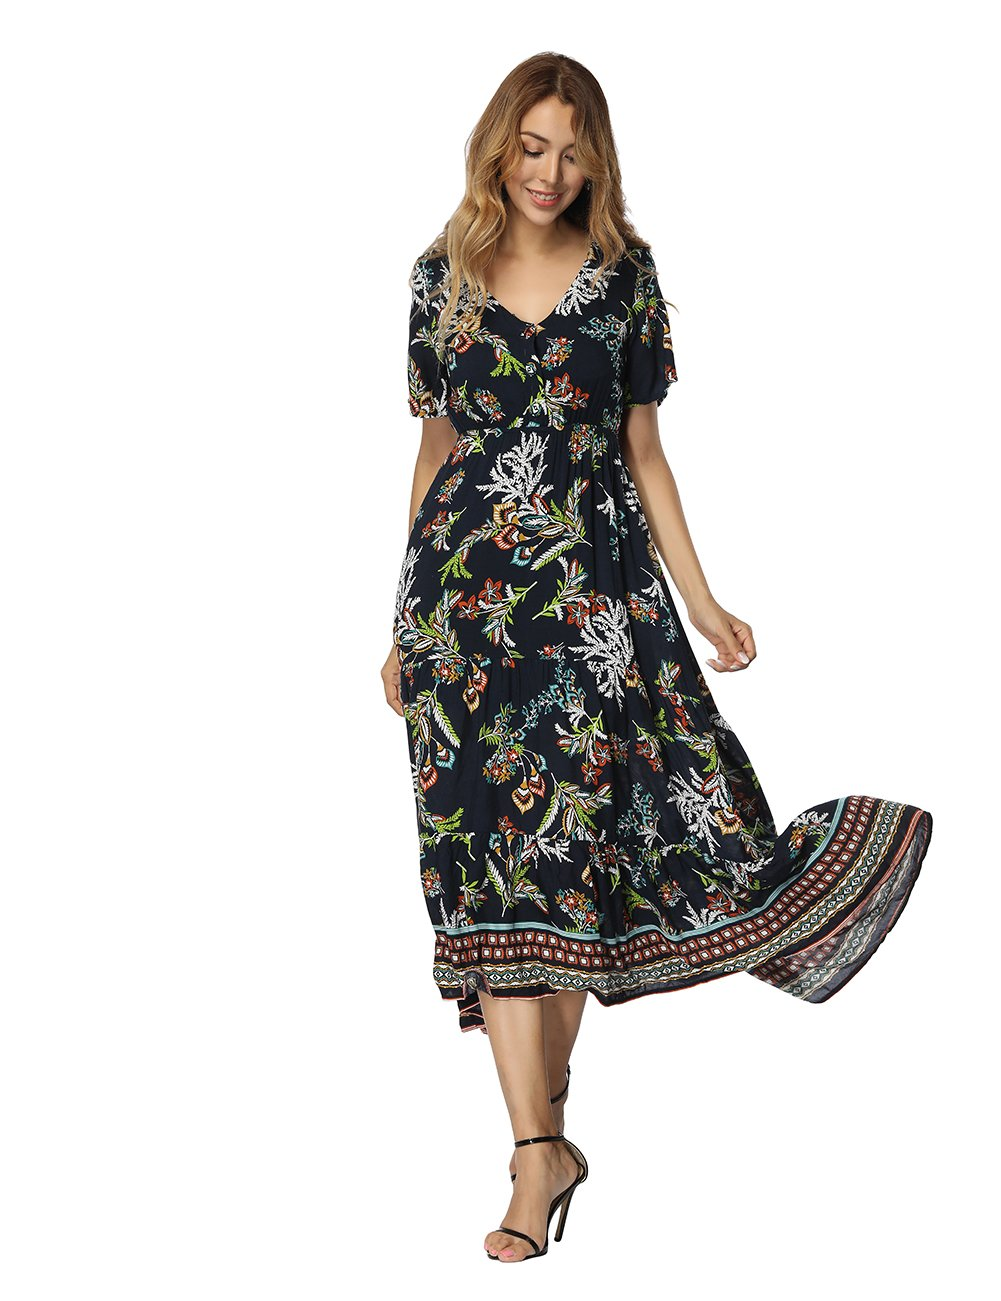 CINDYLOVER Boho Dresses for Women Asymmetrical Floral Print Party Casual Dress Dark Blue L